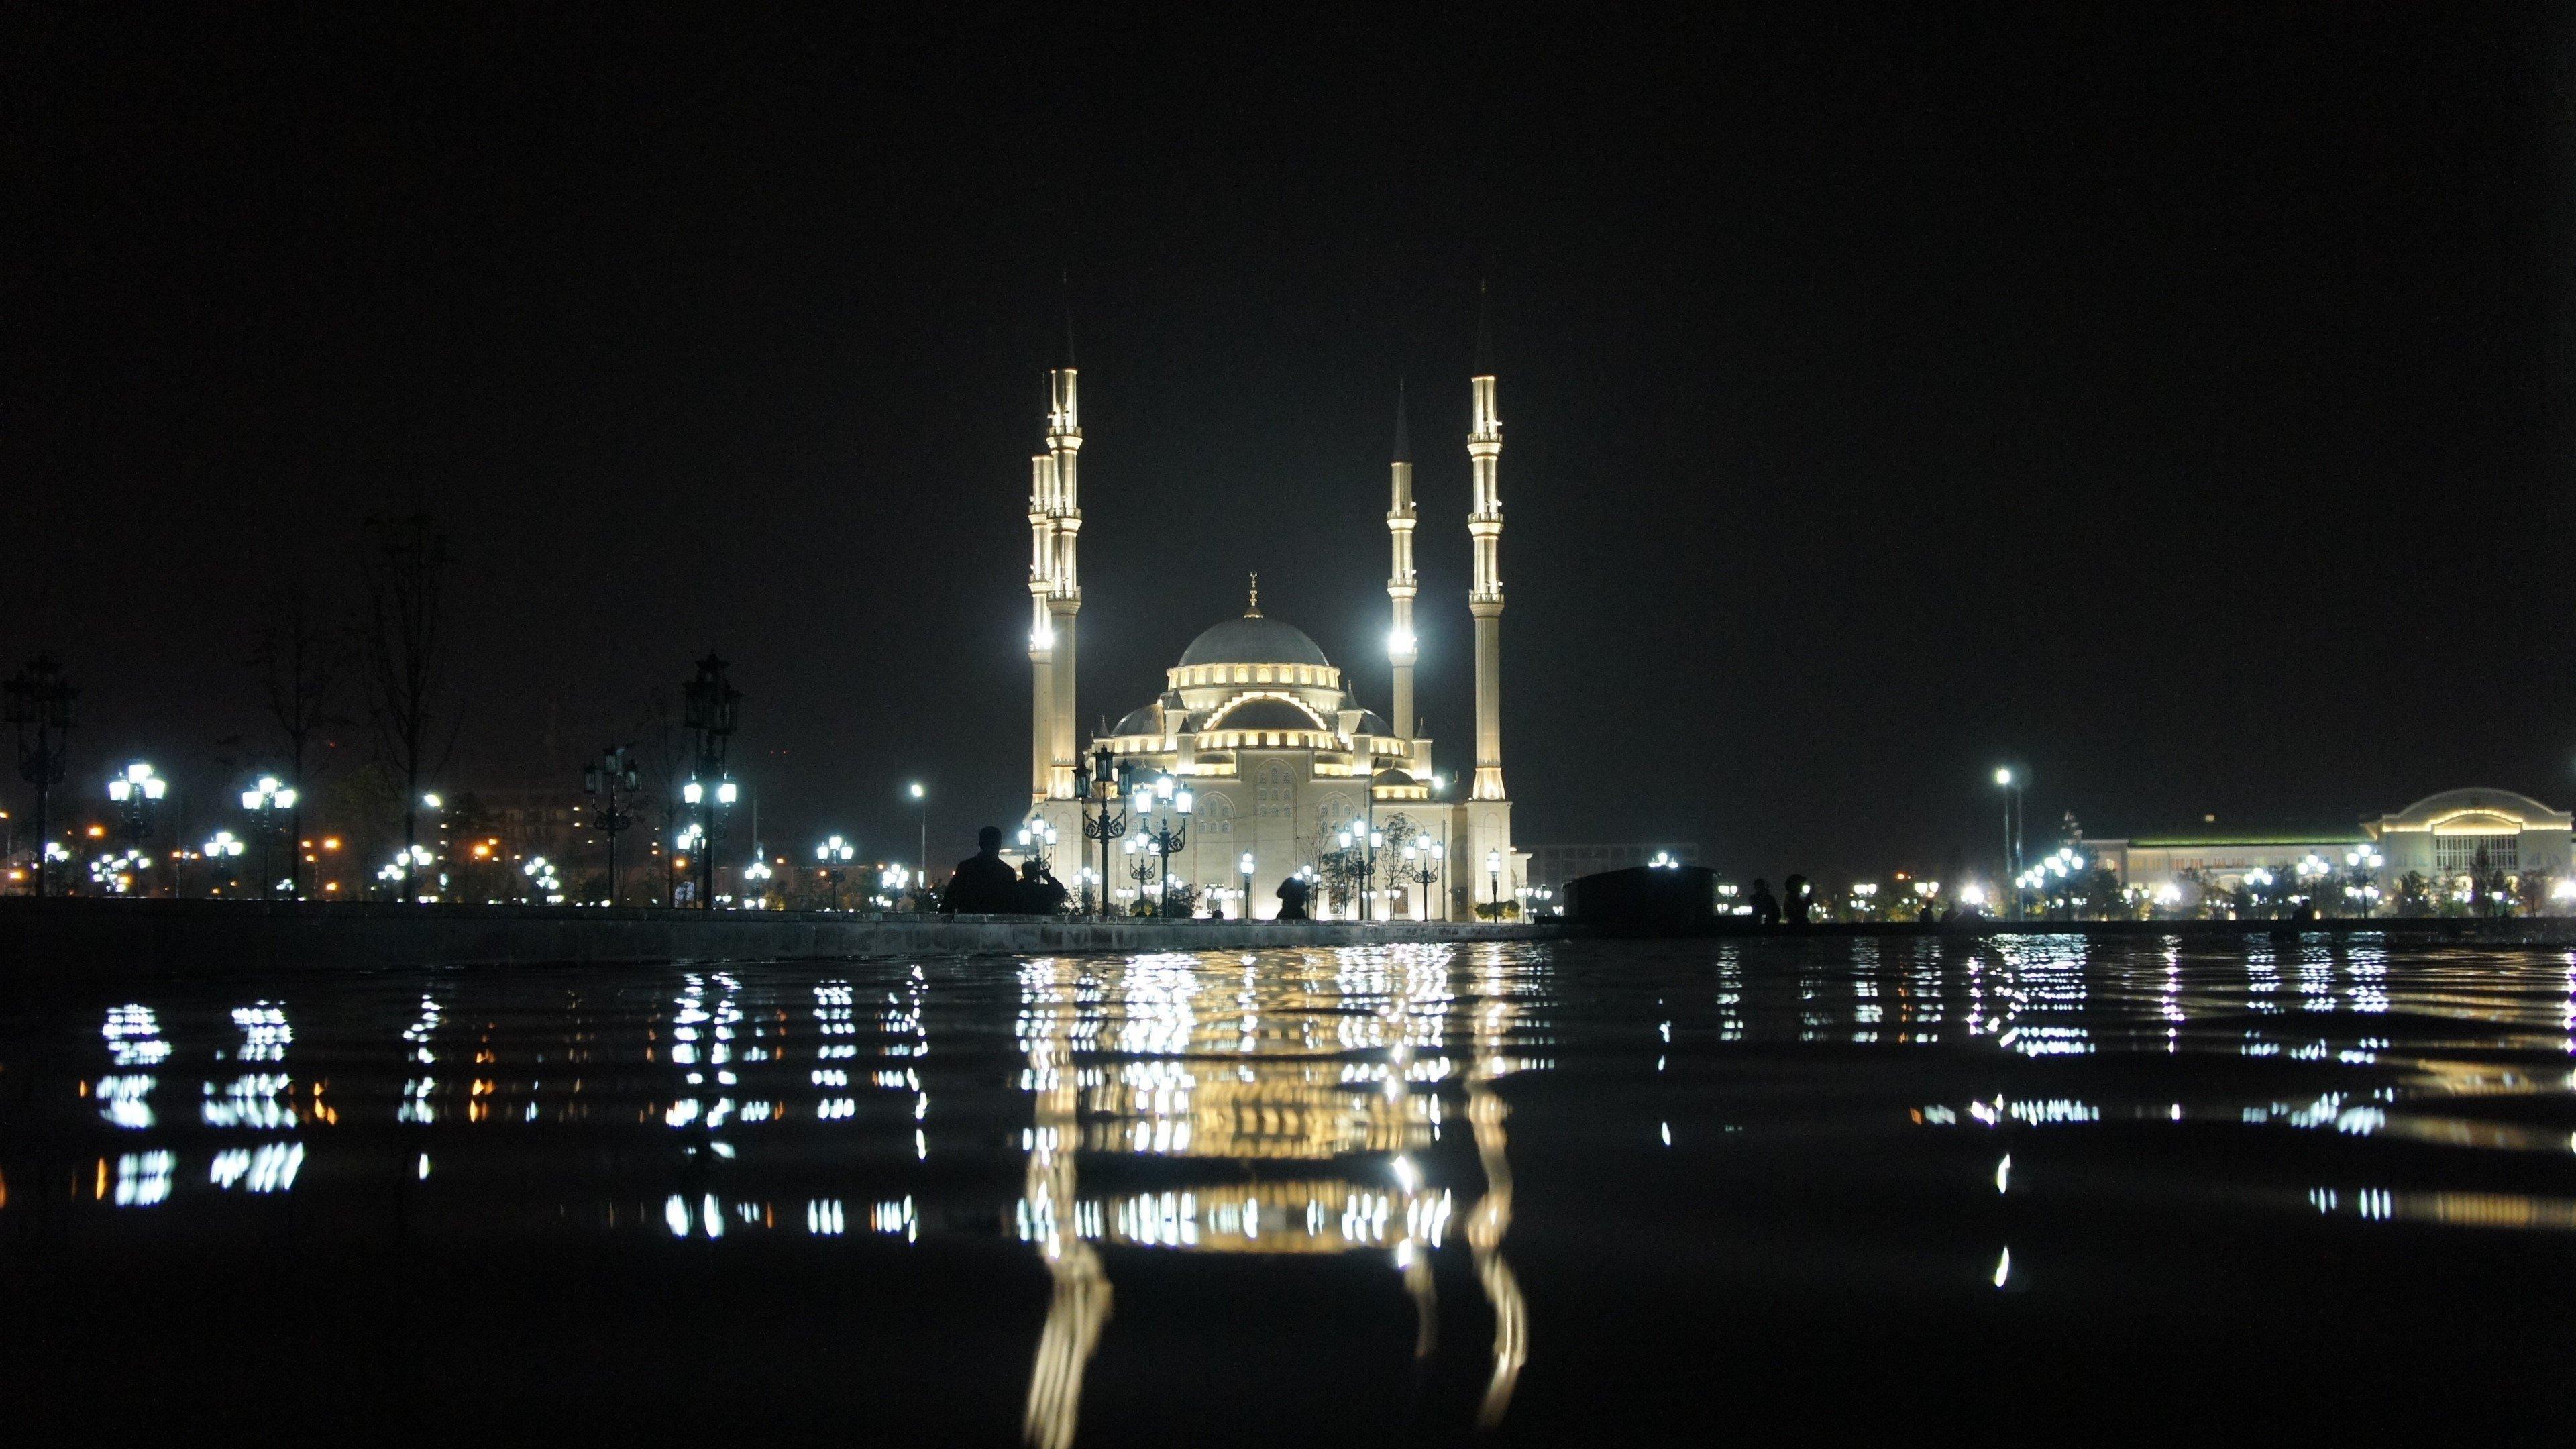 Fondo de pantalla de Taj Mahal de noche Imágenes